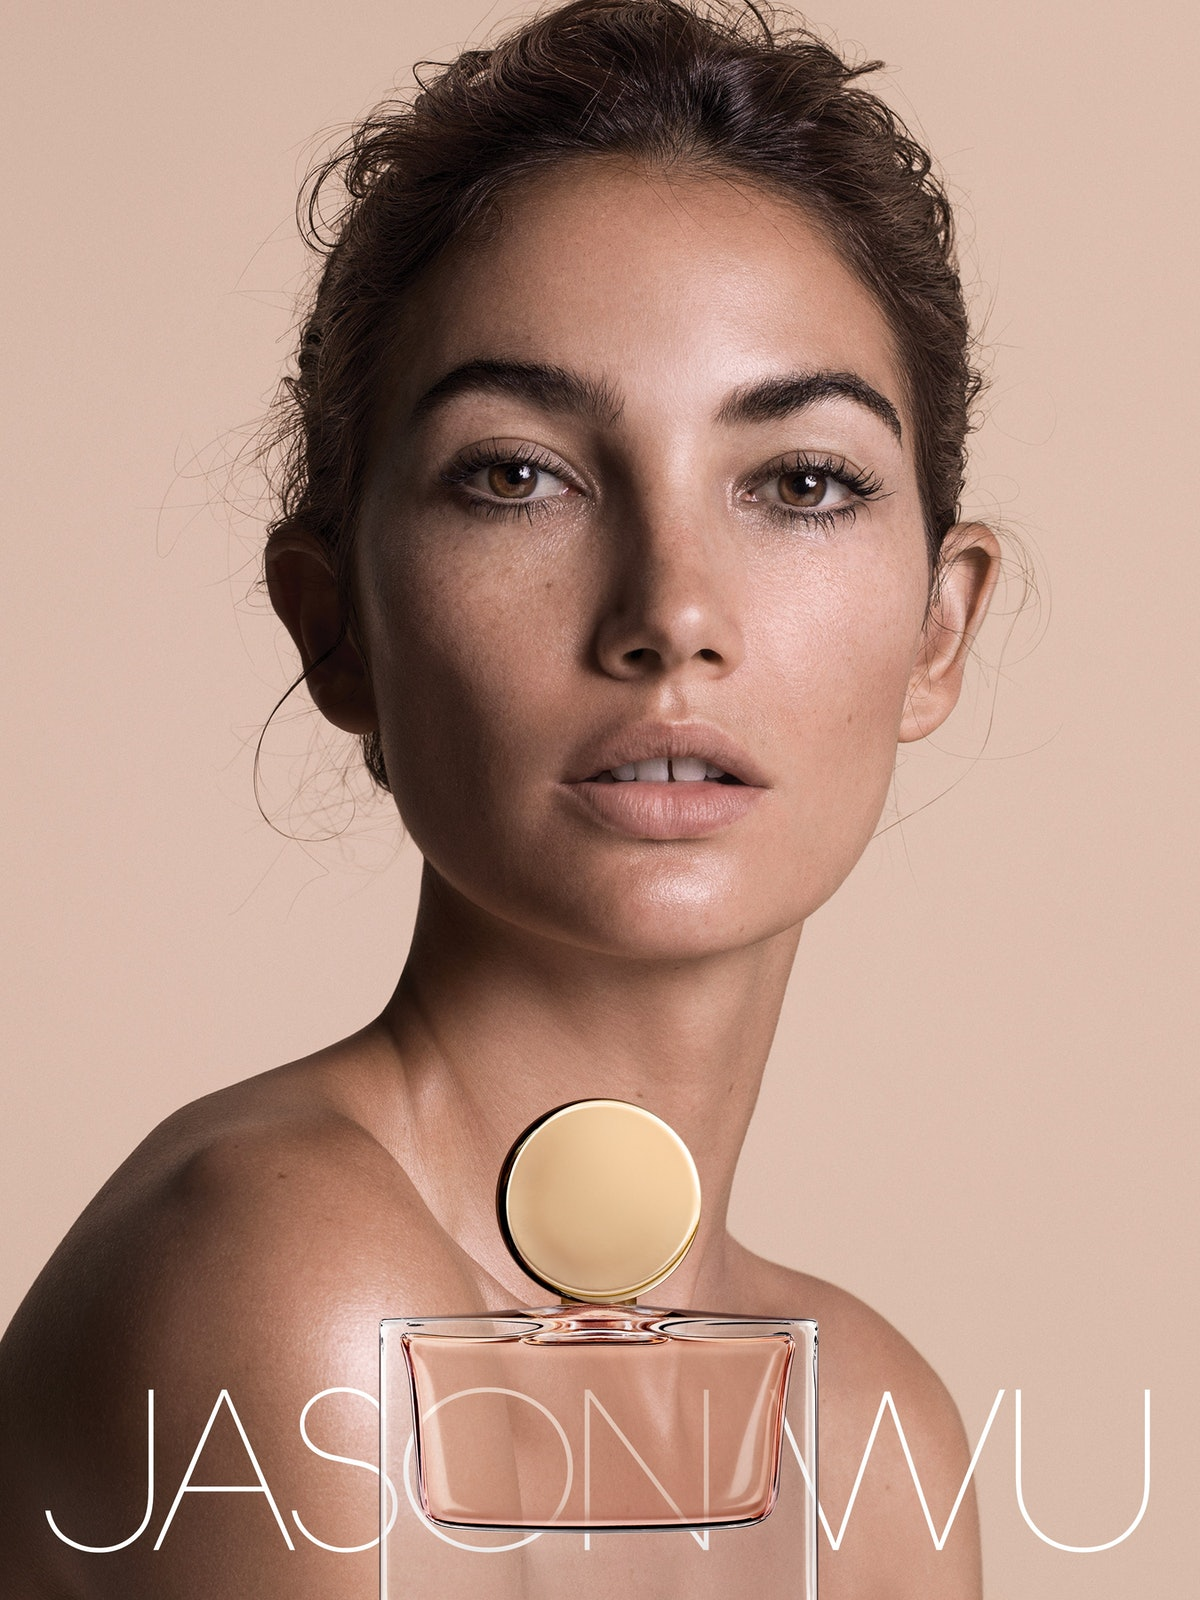 Jason Wu Fragrance Campaign - Shot by Inez & Vinoodh.jpg